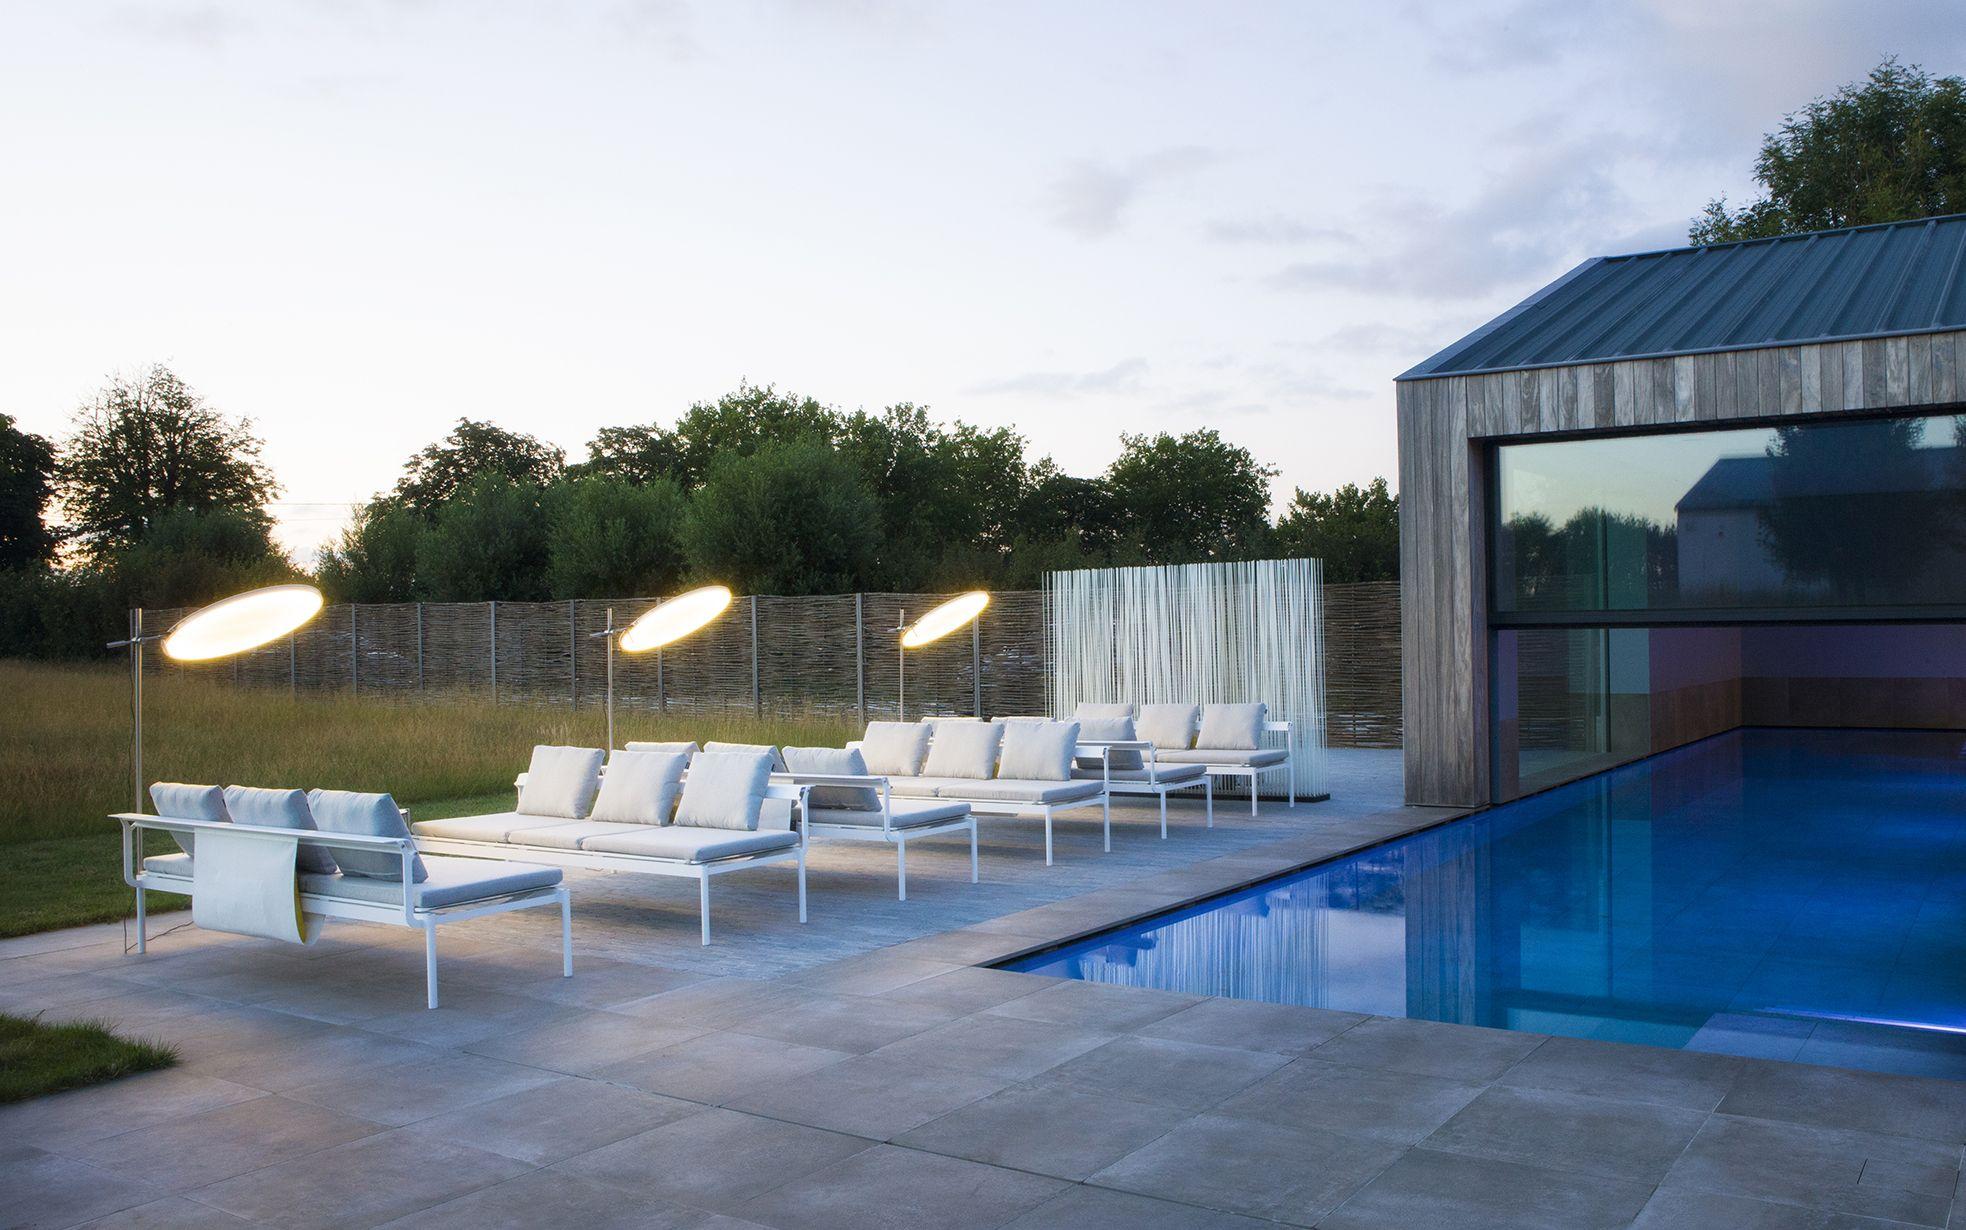 Sol Luna Sunbed Sofa Small Backyard Pools Backyard Pool Designs Swimming Pools Backyard